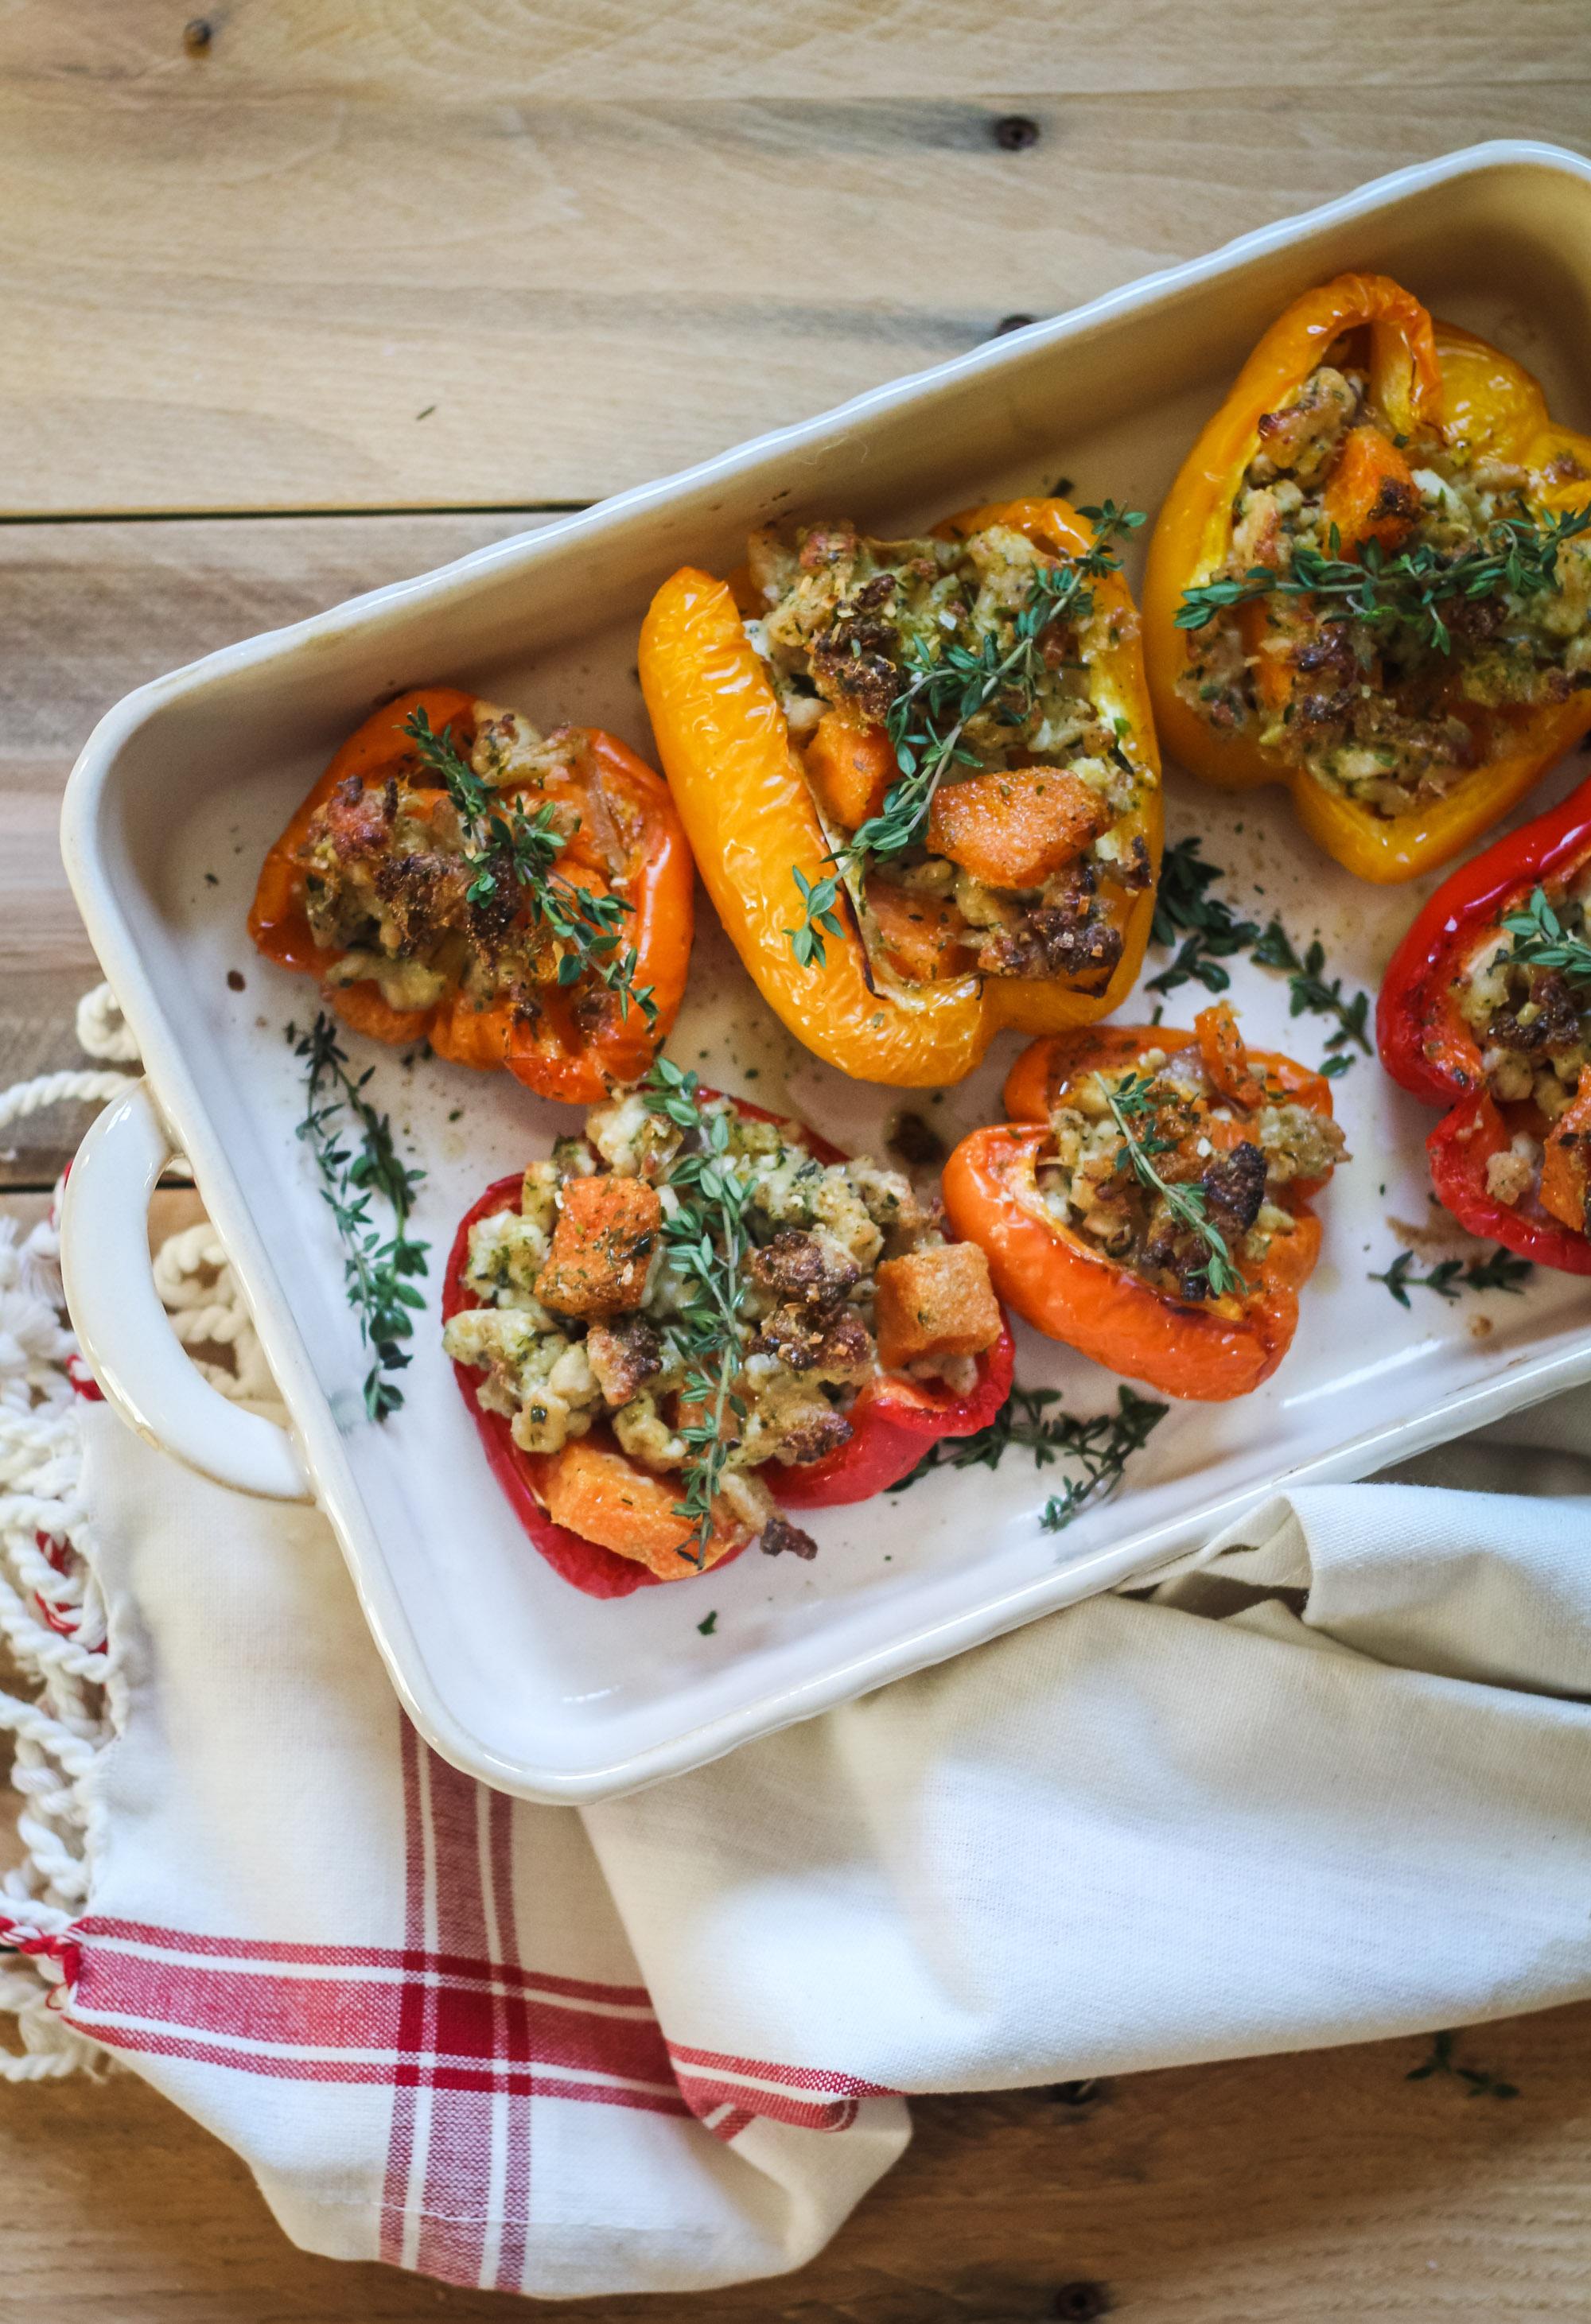 Stuffed Peppers recipe